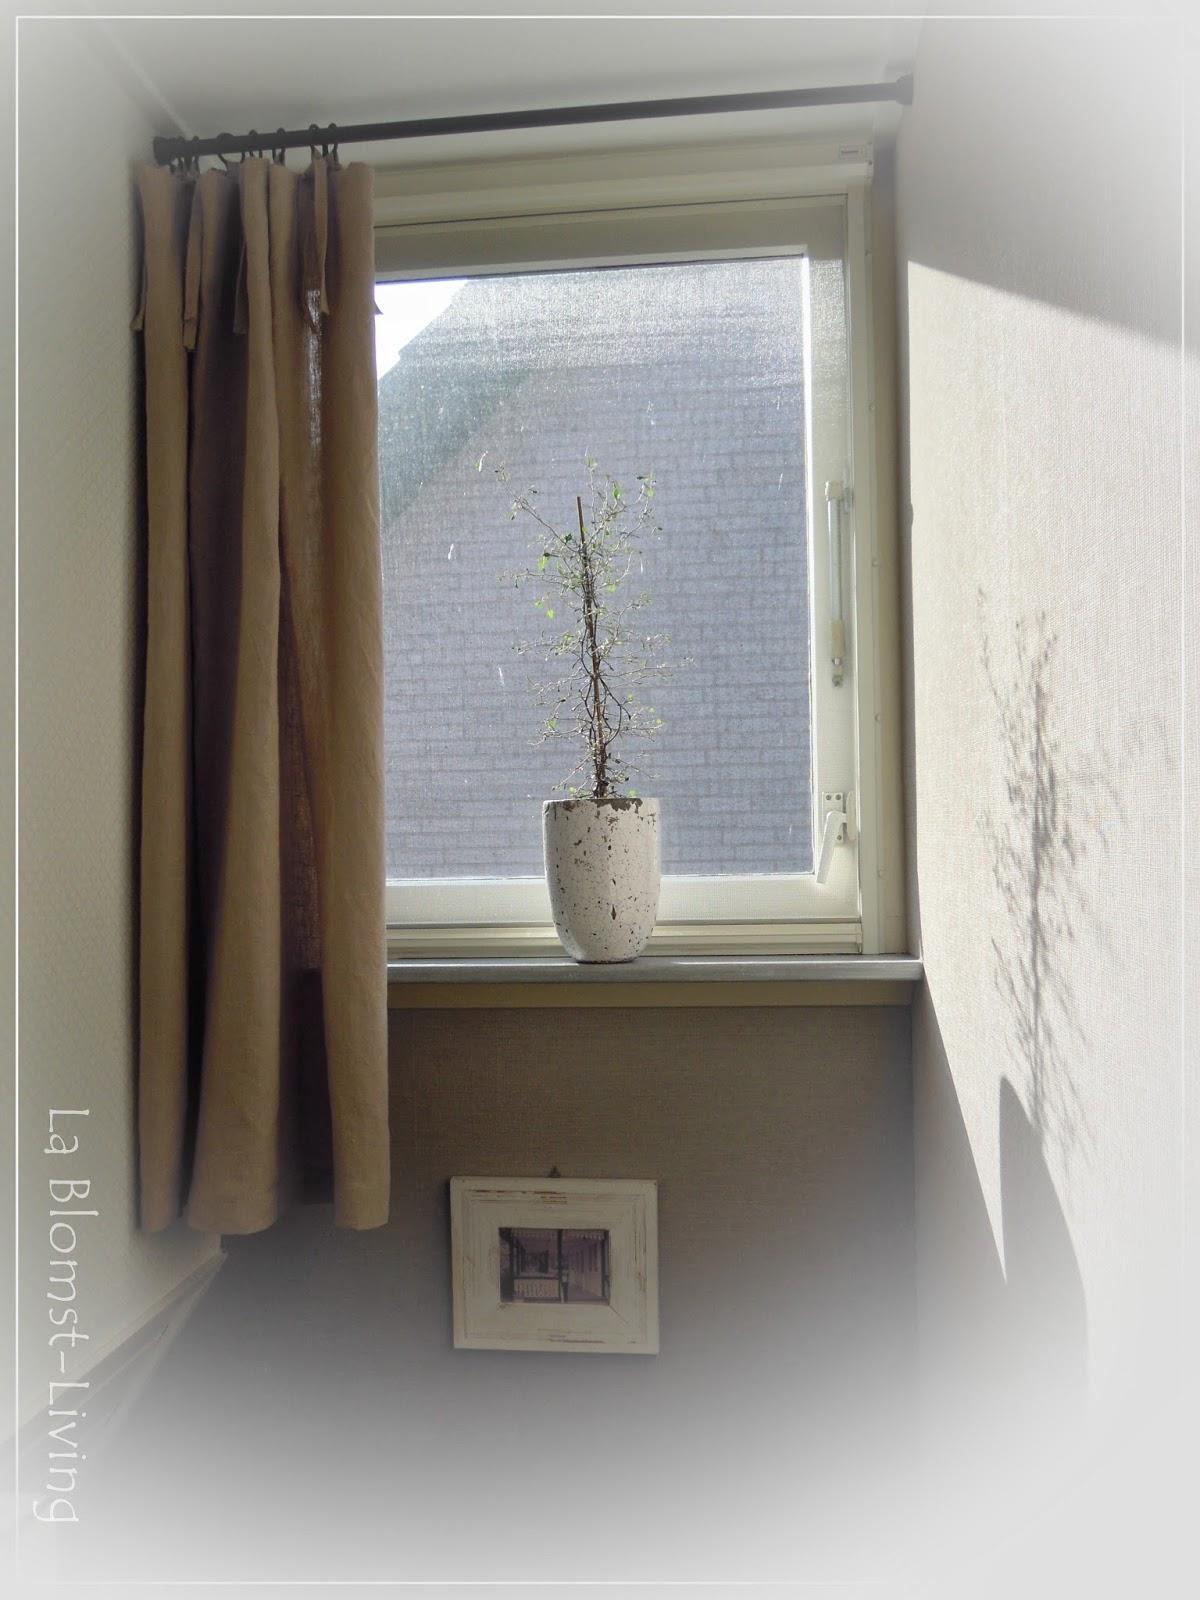 La Blomst-Living: Gordijn en plant